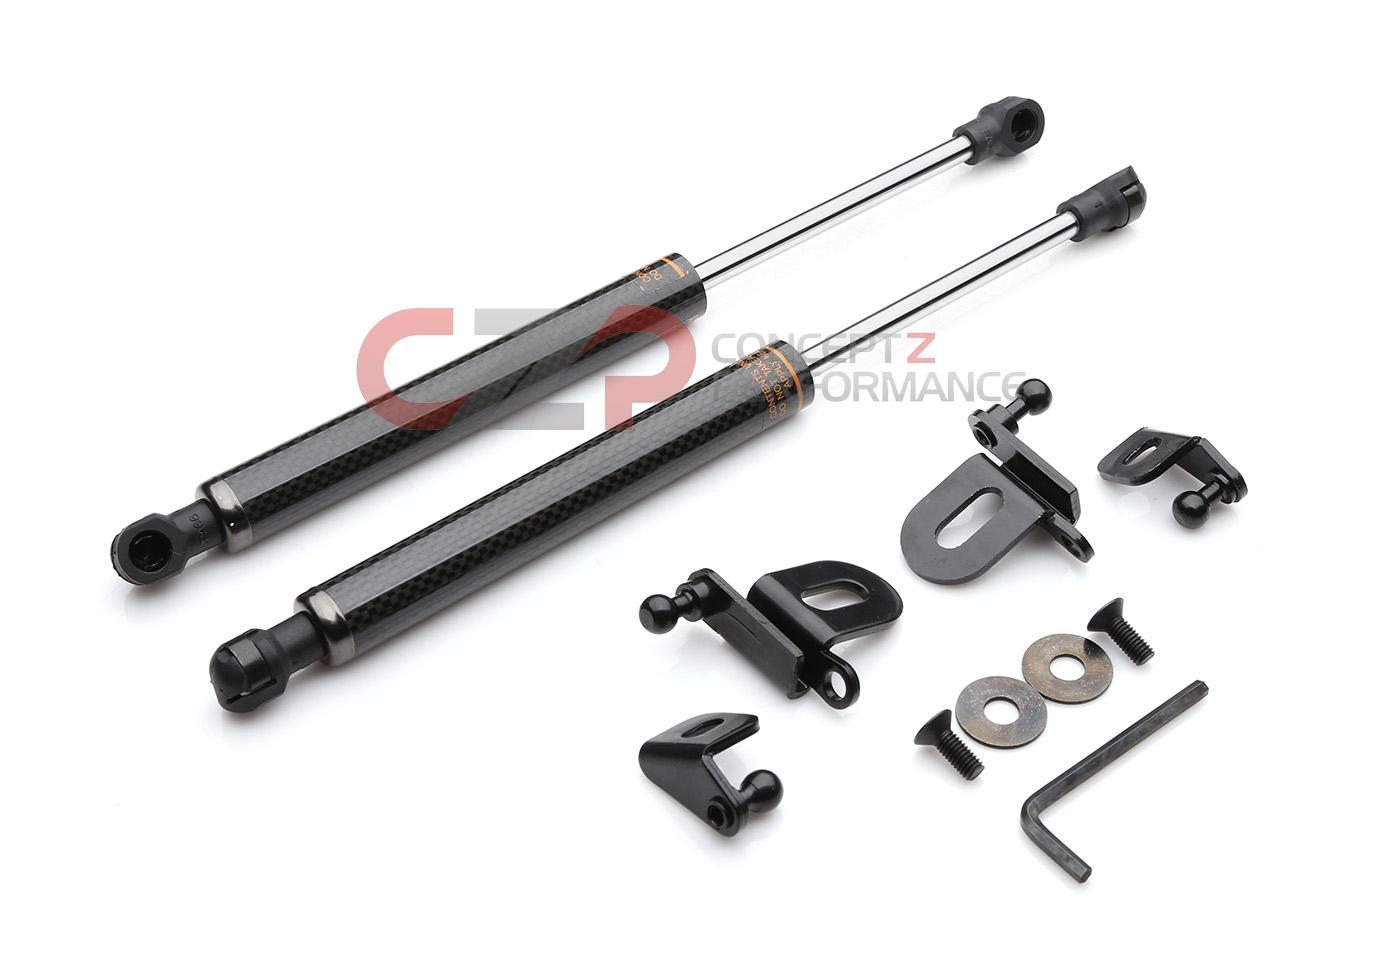 Circuit Sports Ehd Ig35c Tp Hood Damper Strut Kit Carbon